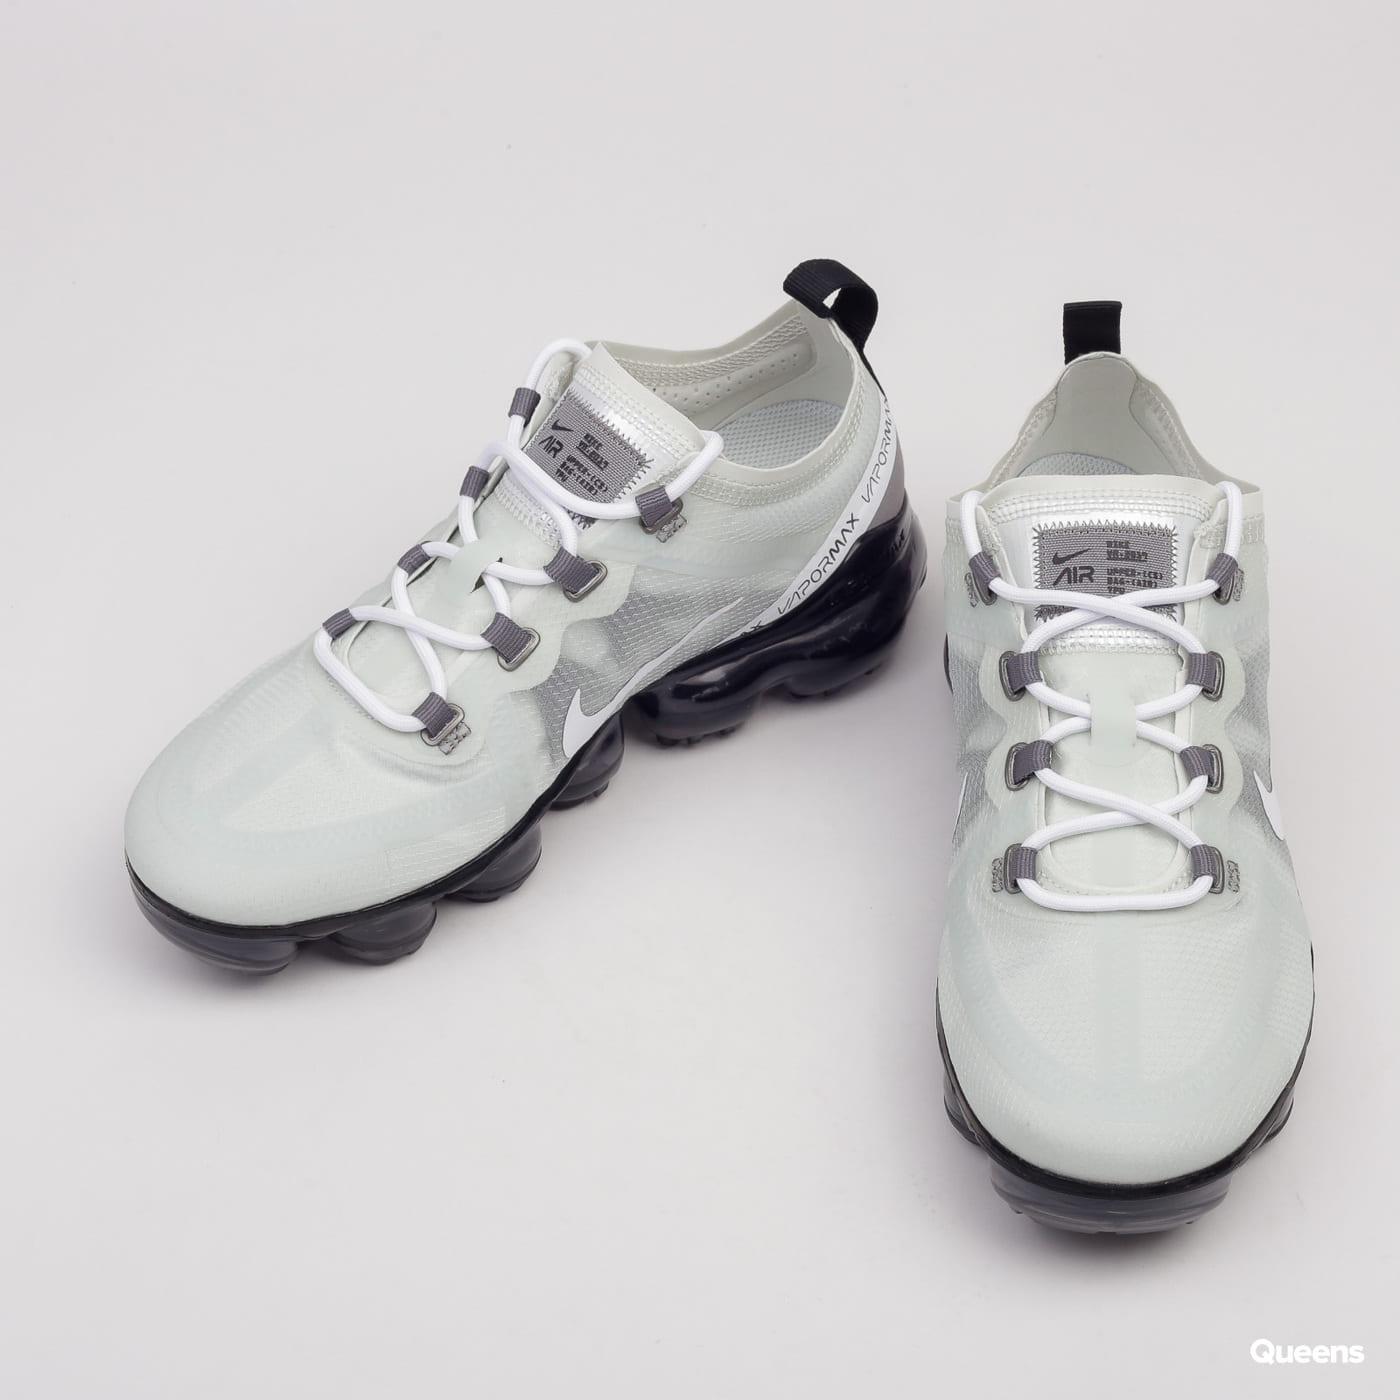 Nike WMNS Air Vapormax 2019 spruce aura / white - mtlc pewter